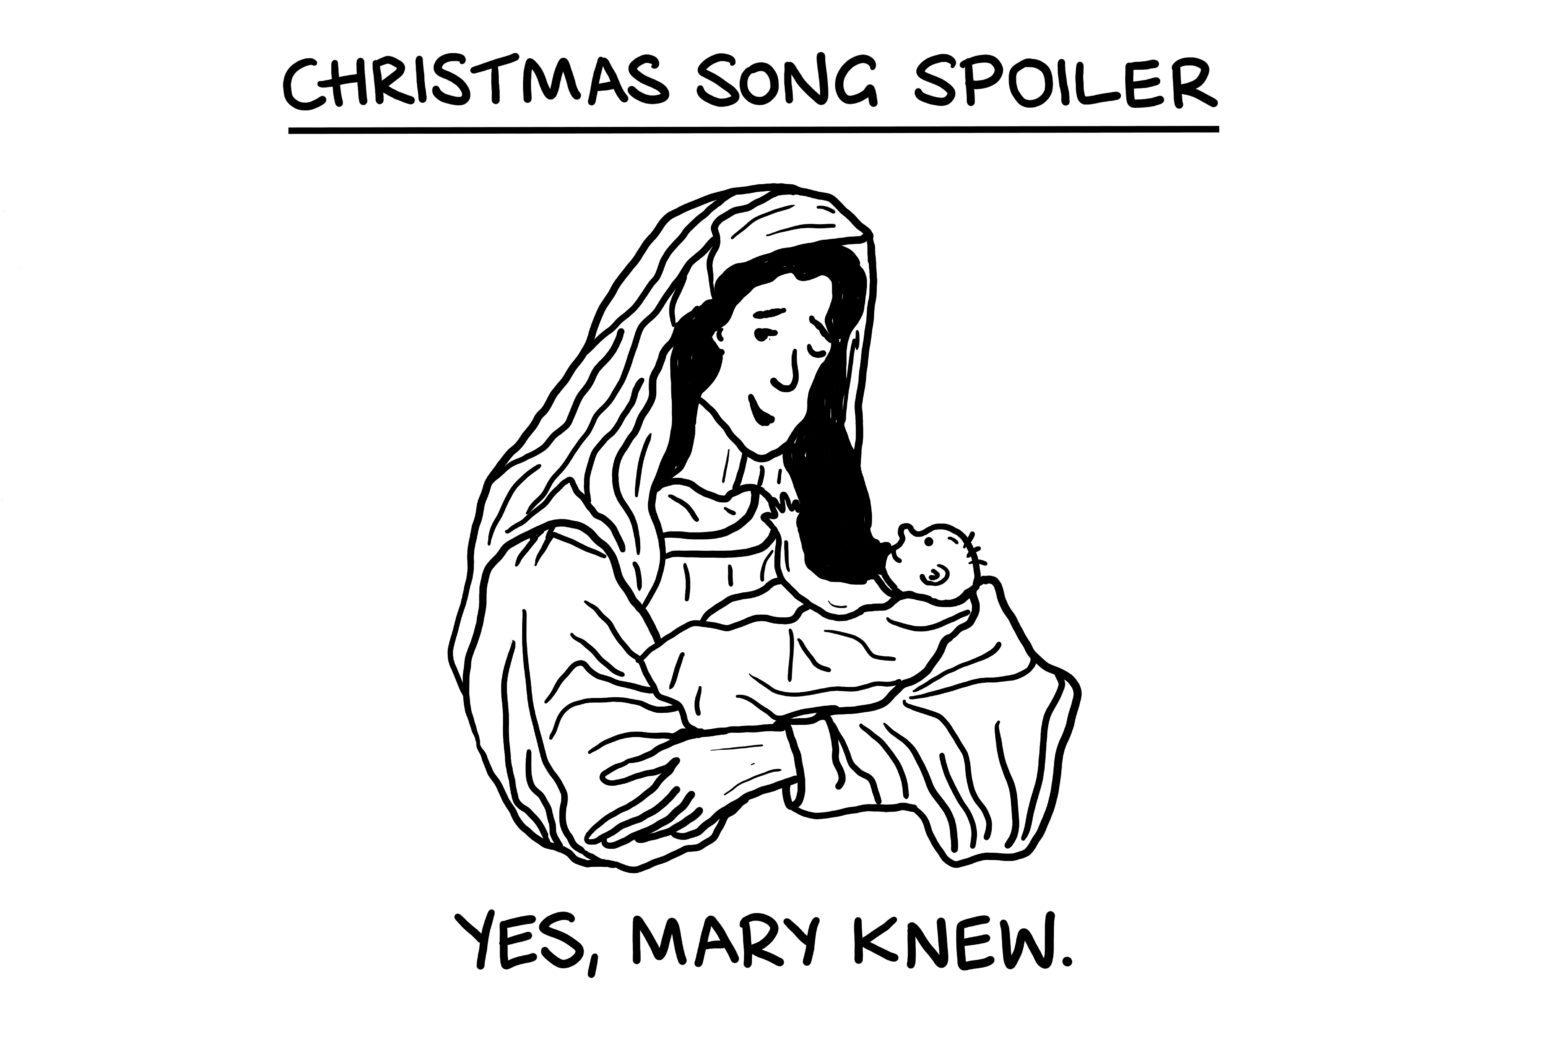 Christmas song spoiler